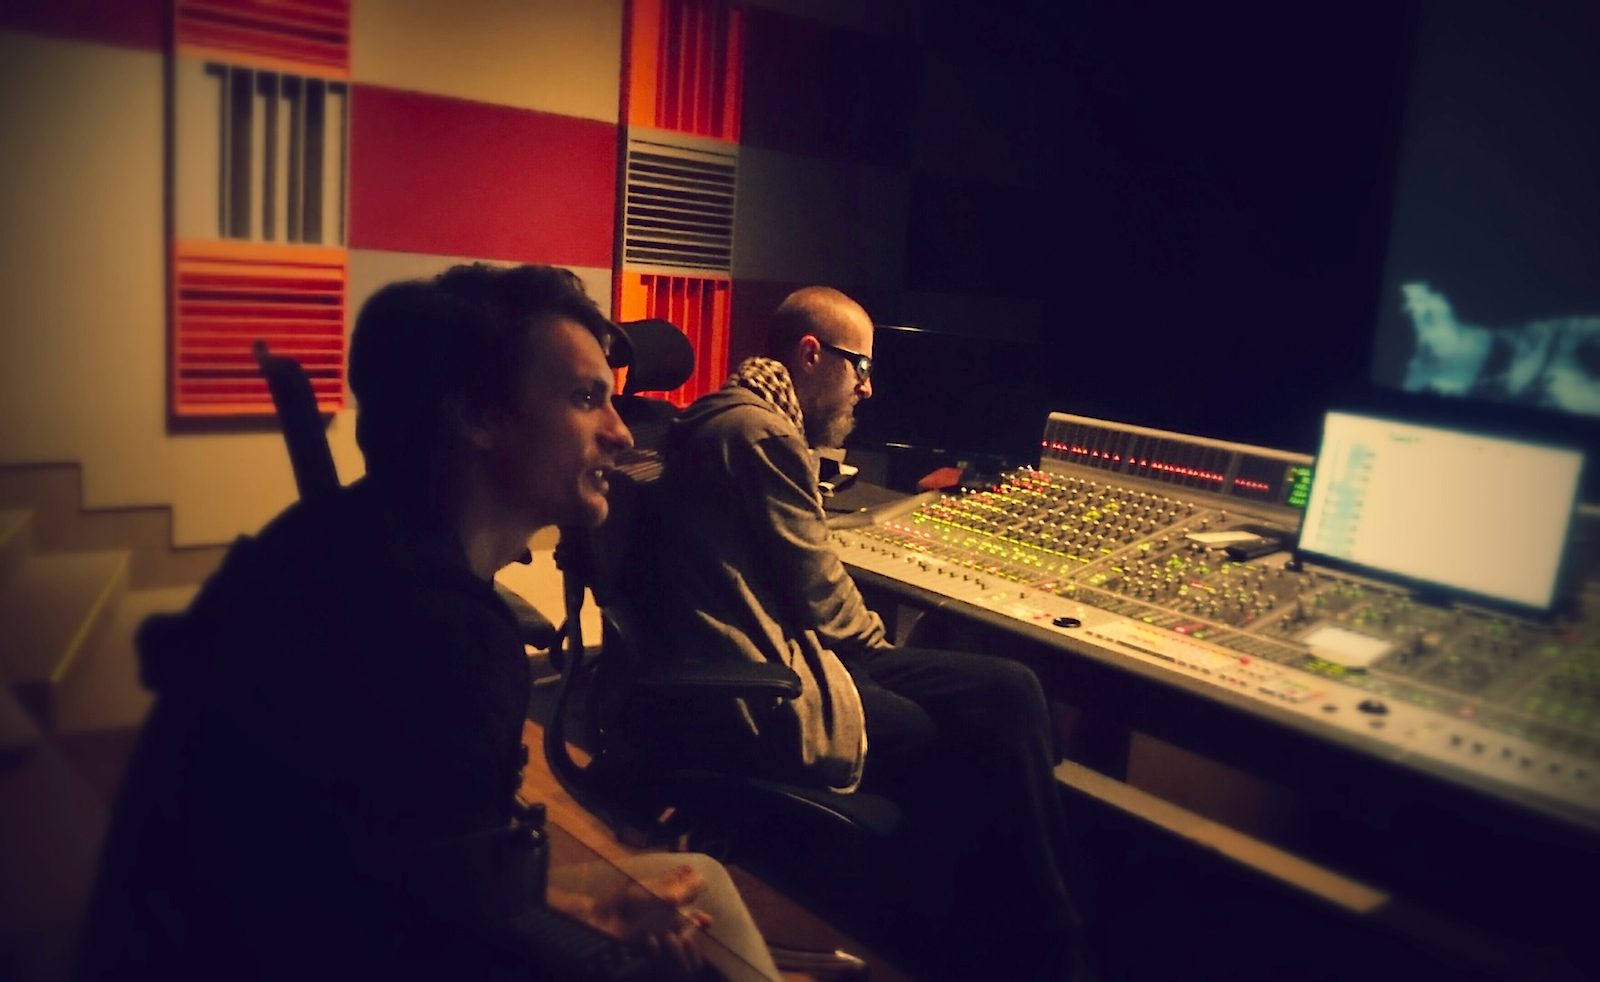 Atanas Valkov with Tomek Baginski mixing Ambition @ DreamSound